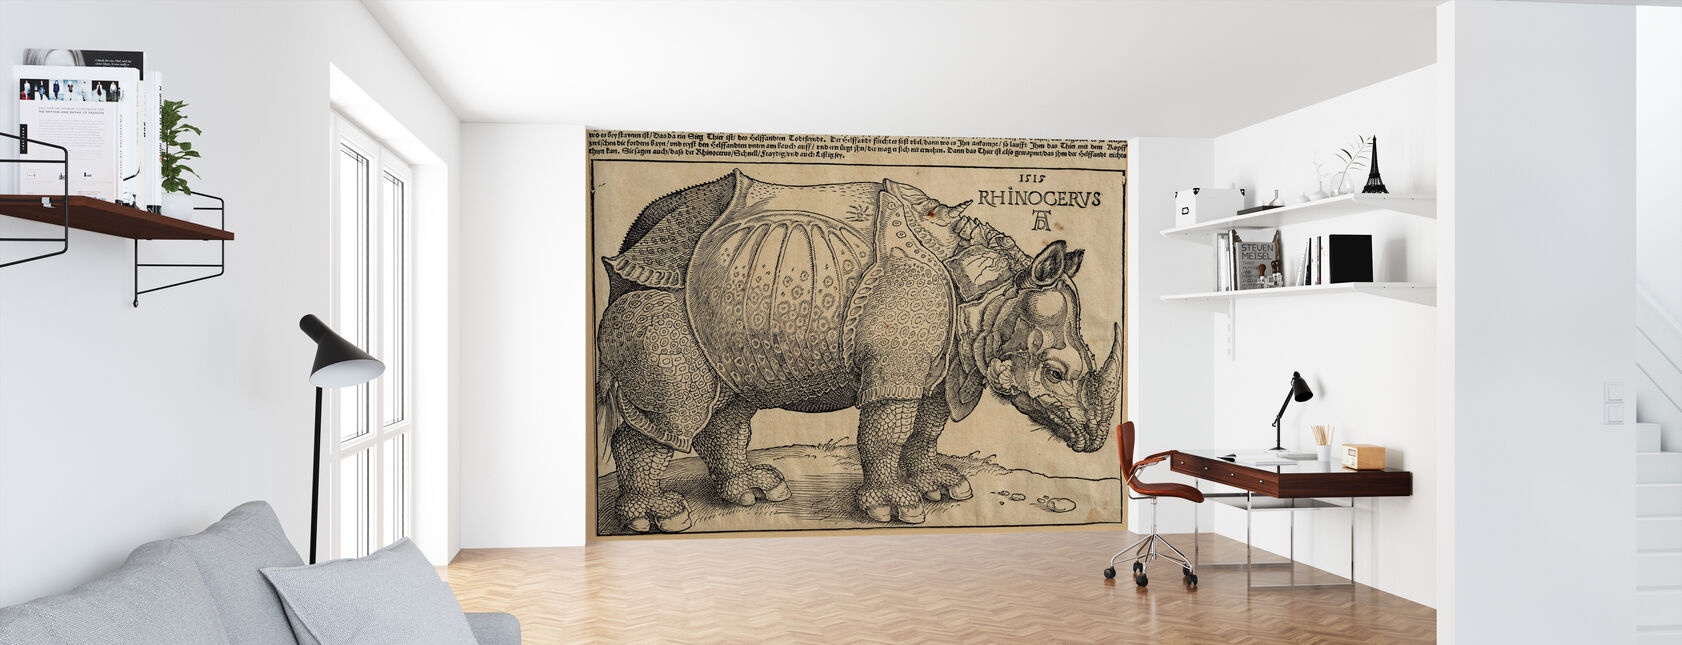 Rhinoceros - Abrecht Durer - Wallpaper - Office